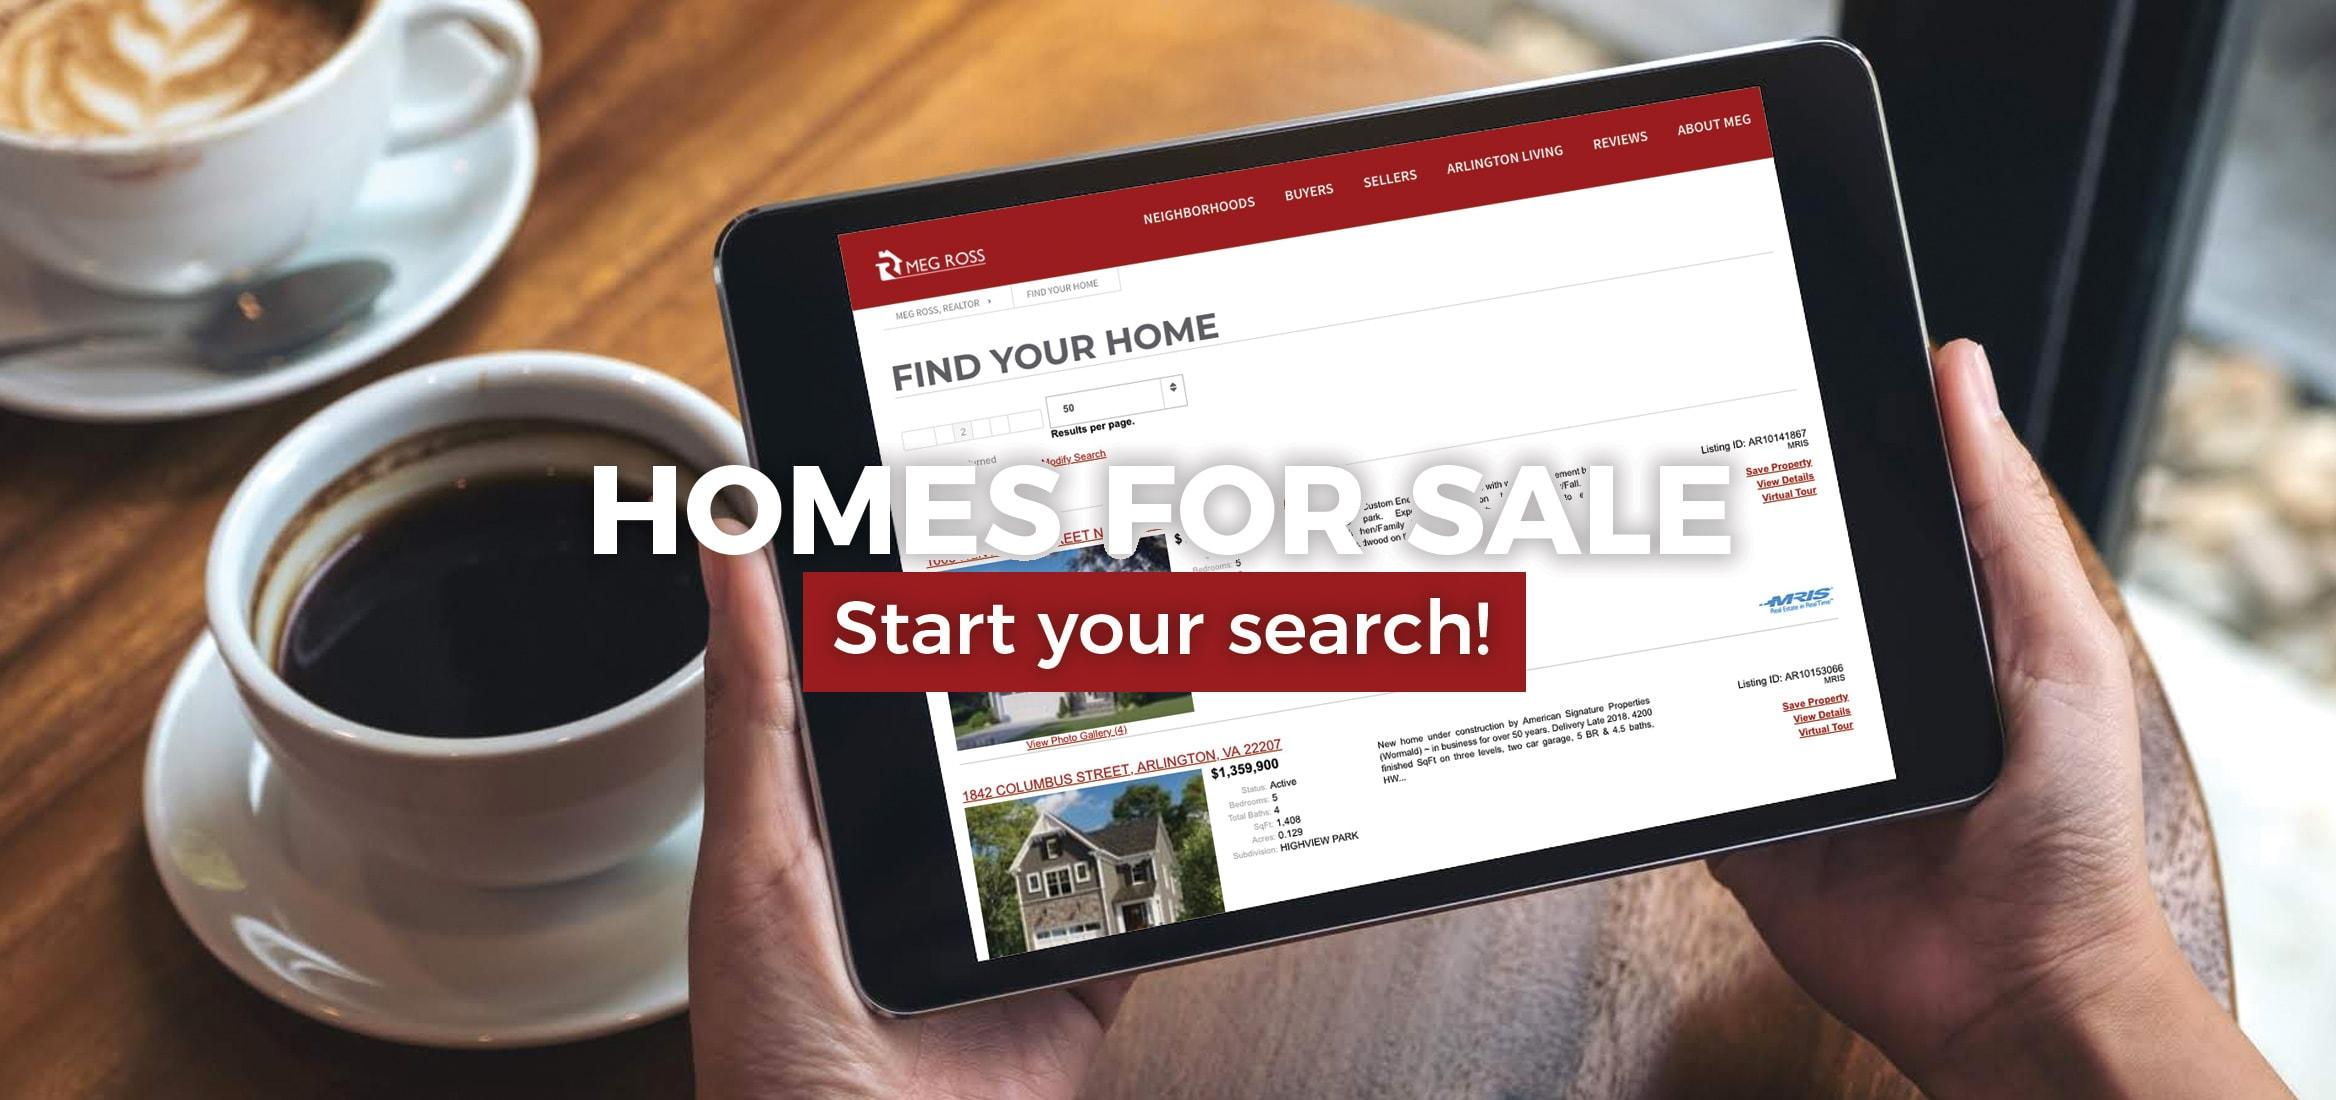 arlington_virginia_search_homes_for_sale